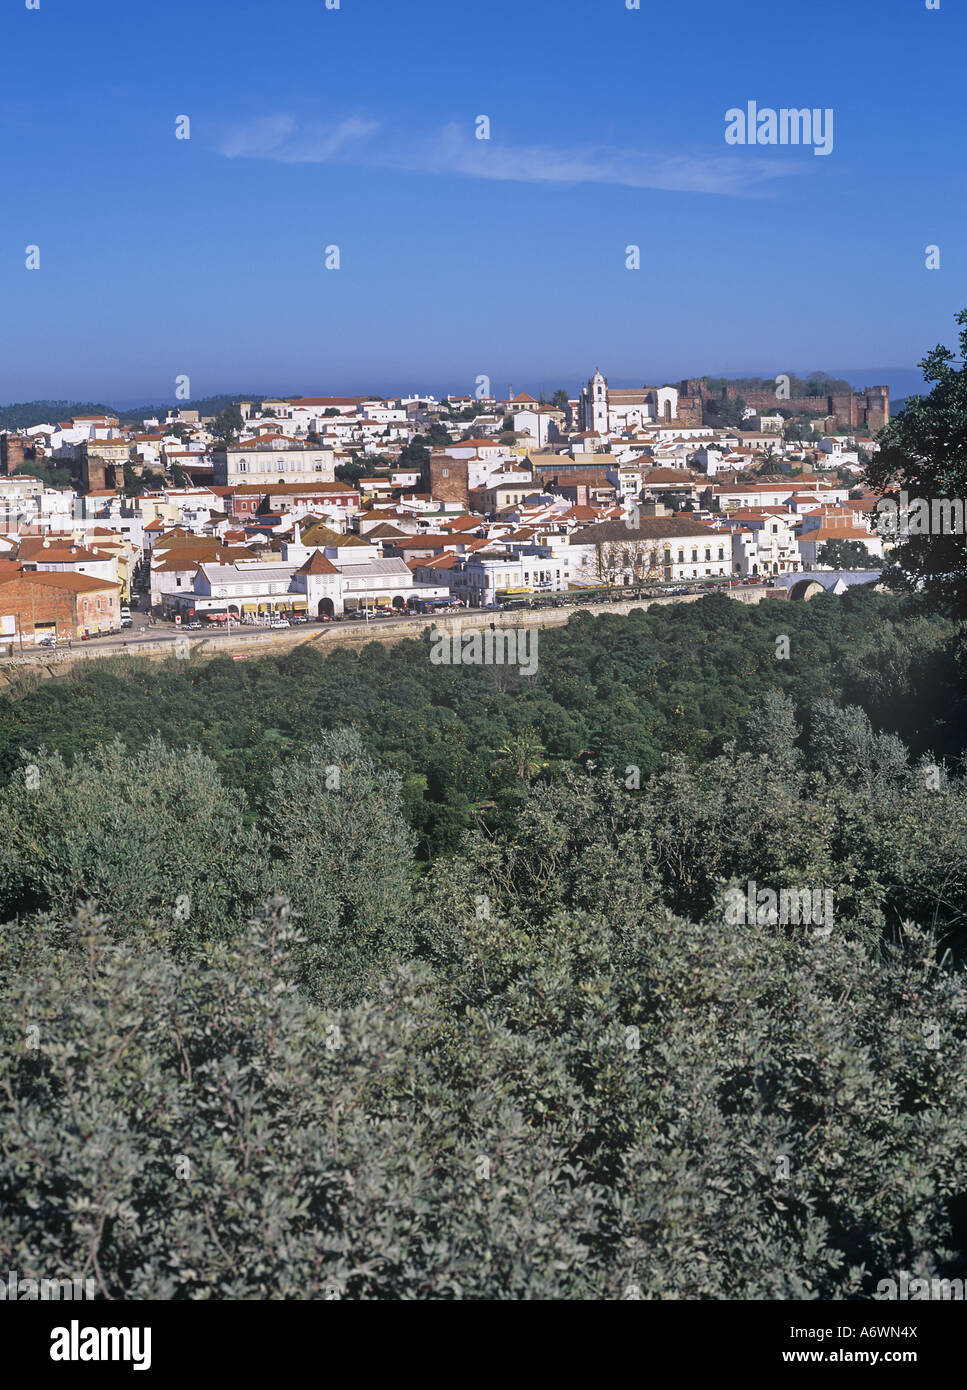 Silves, Algarve, Portugal, Europe. - Stock Image